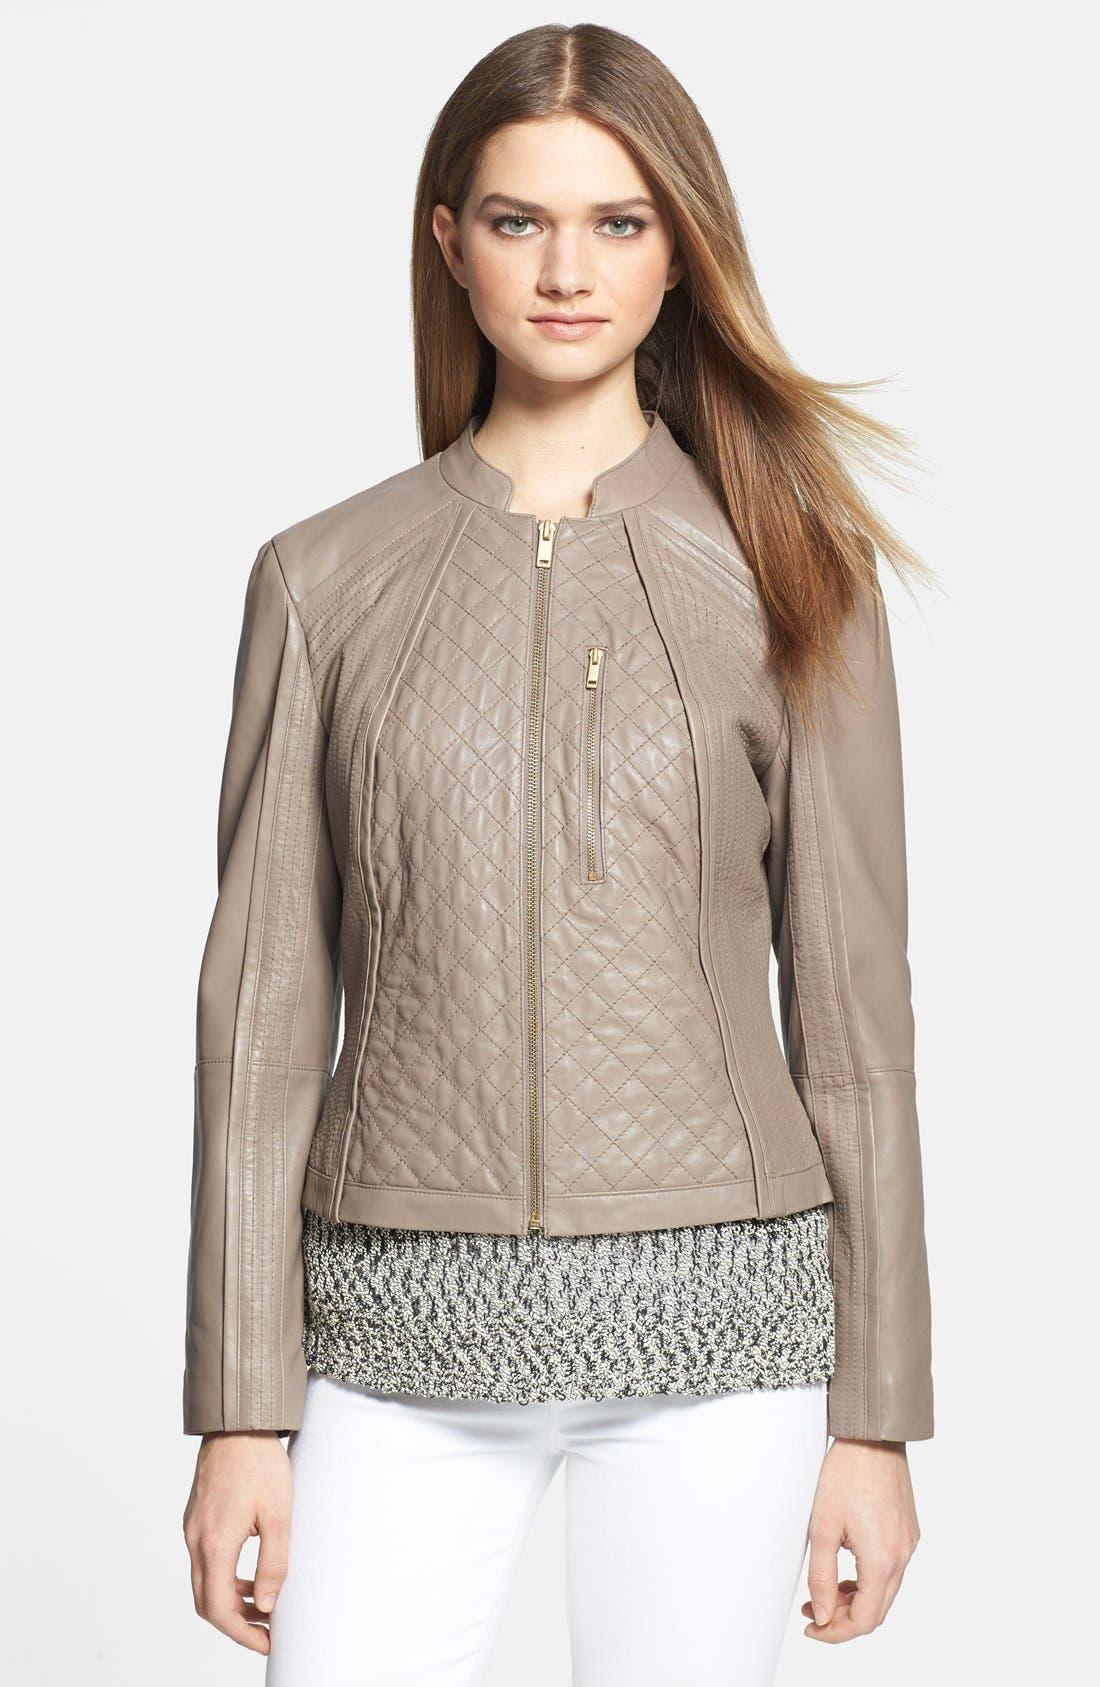 Alternate Image 1 Selected - Trina Turk 'Winston' Zip Front Leather Jacket